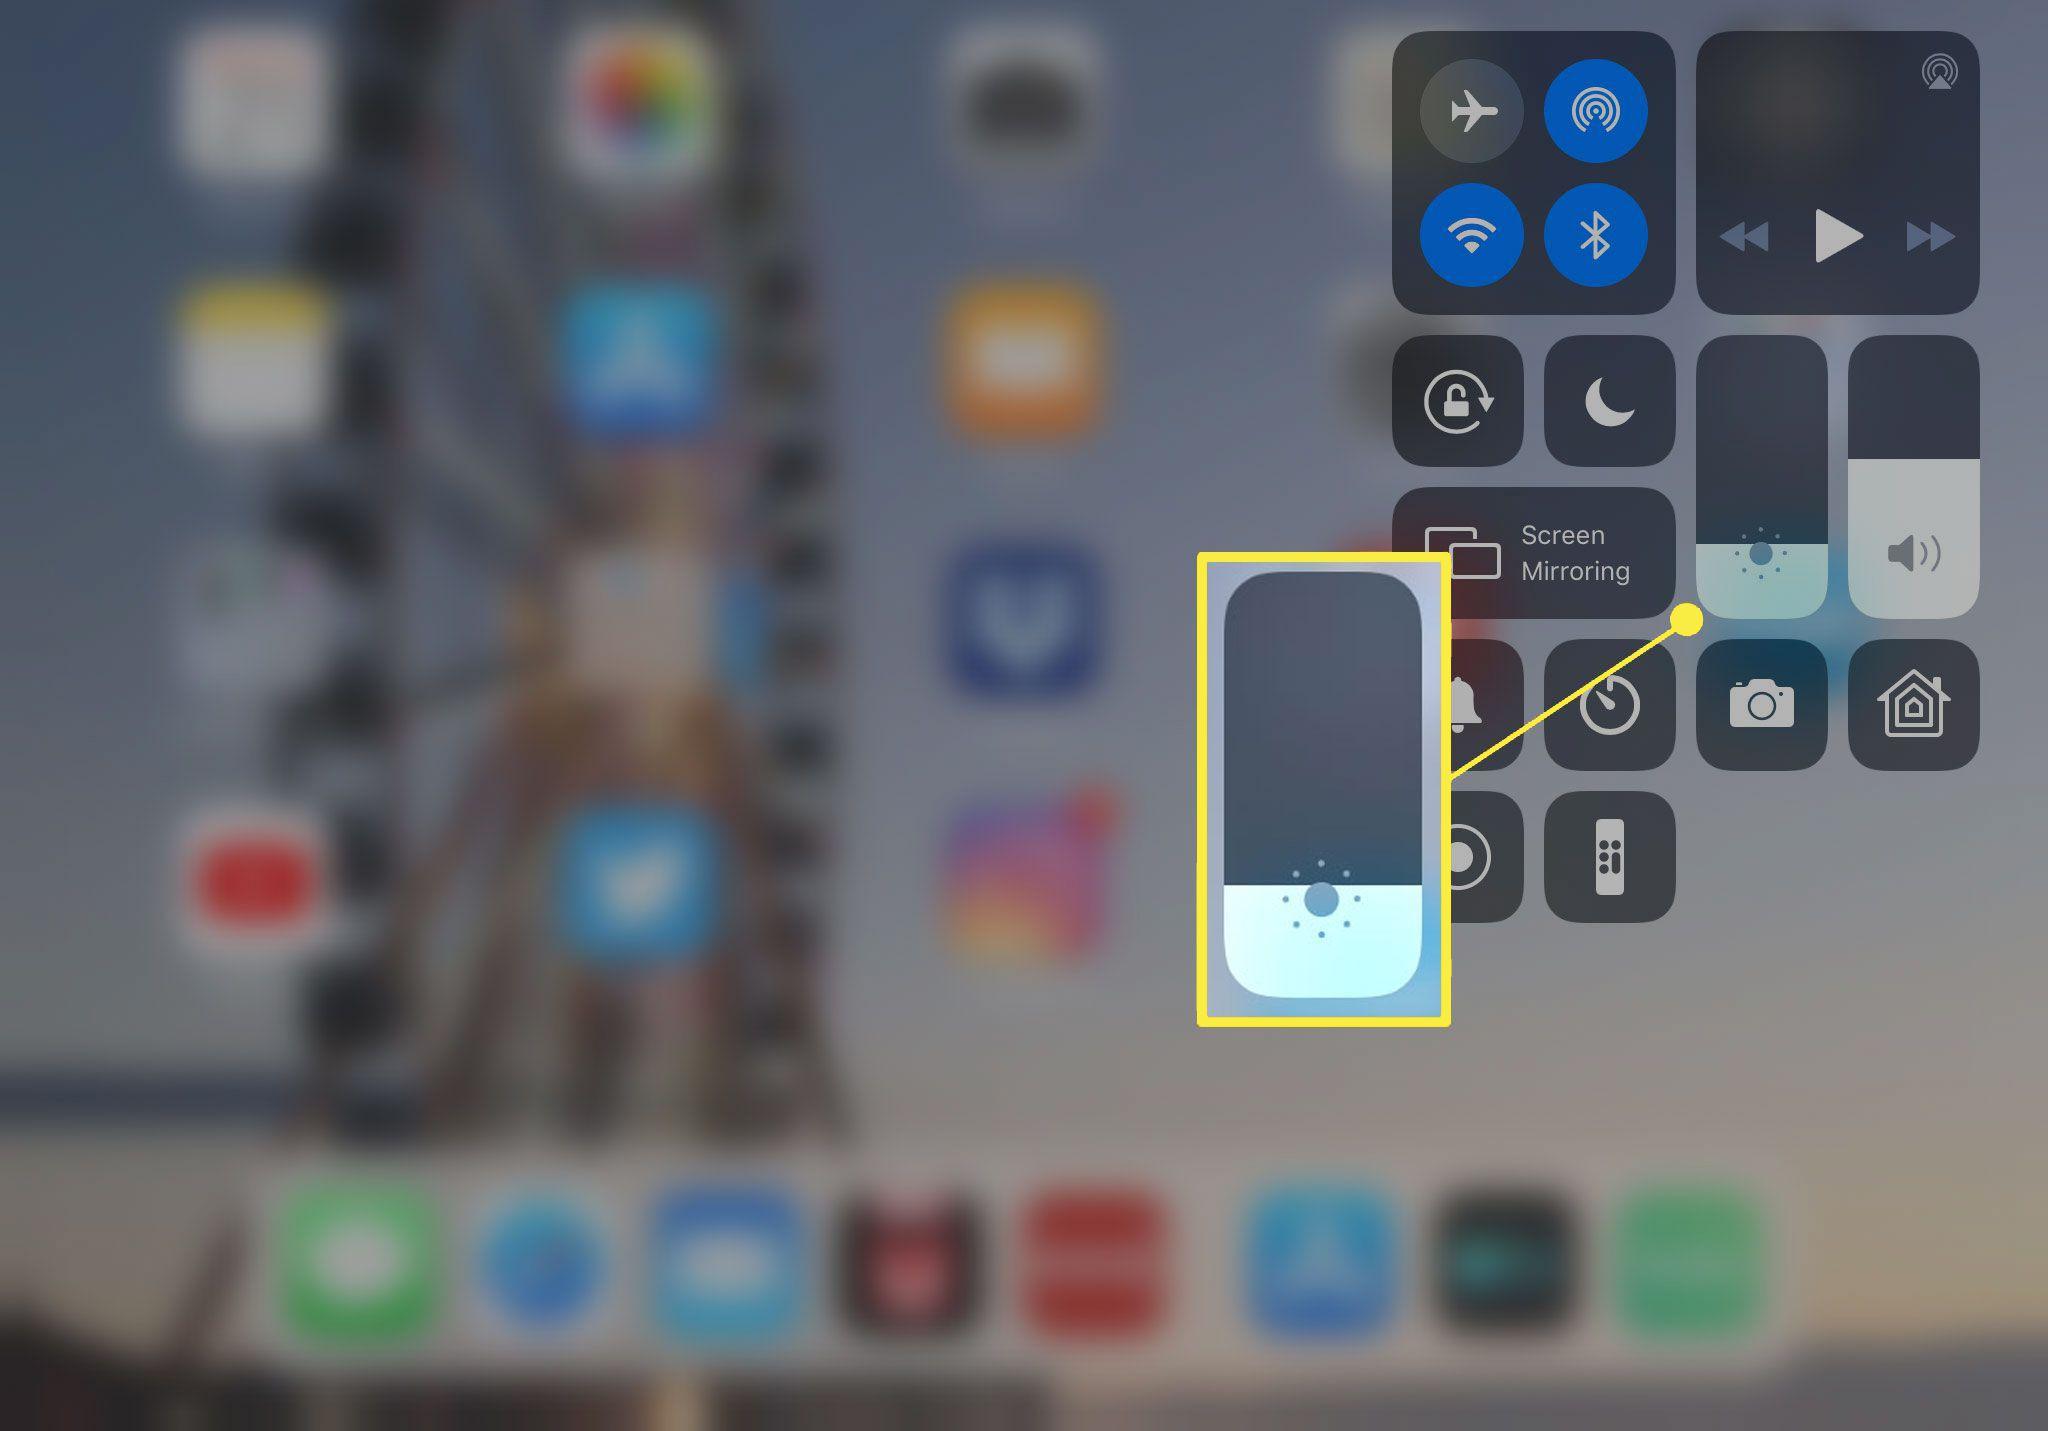 How to adjust iPad brightness